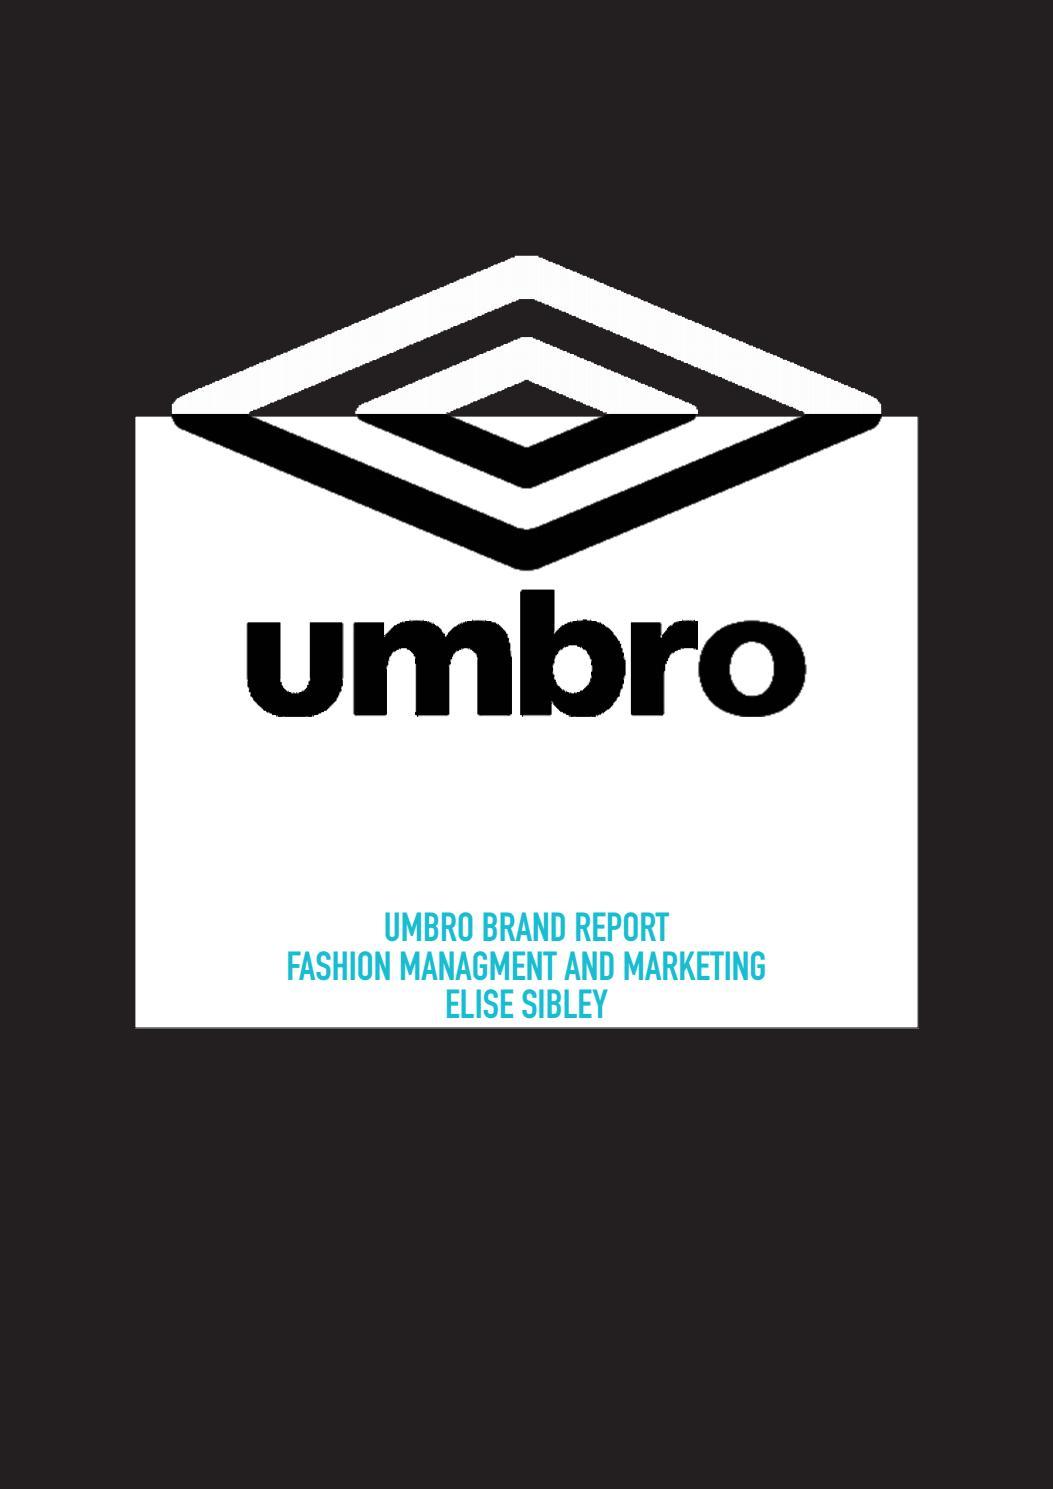 umbro official website